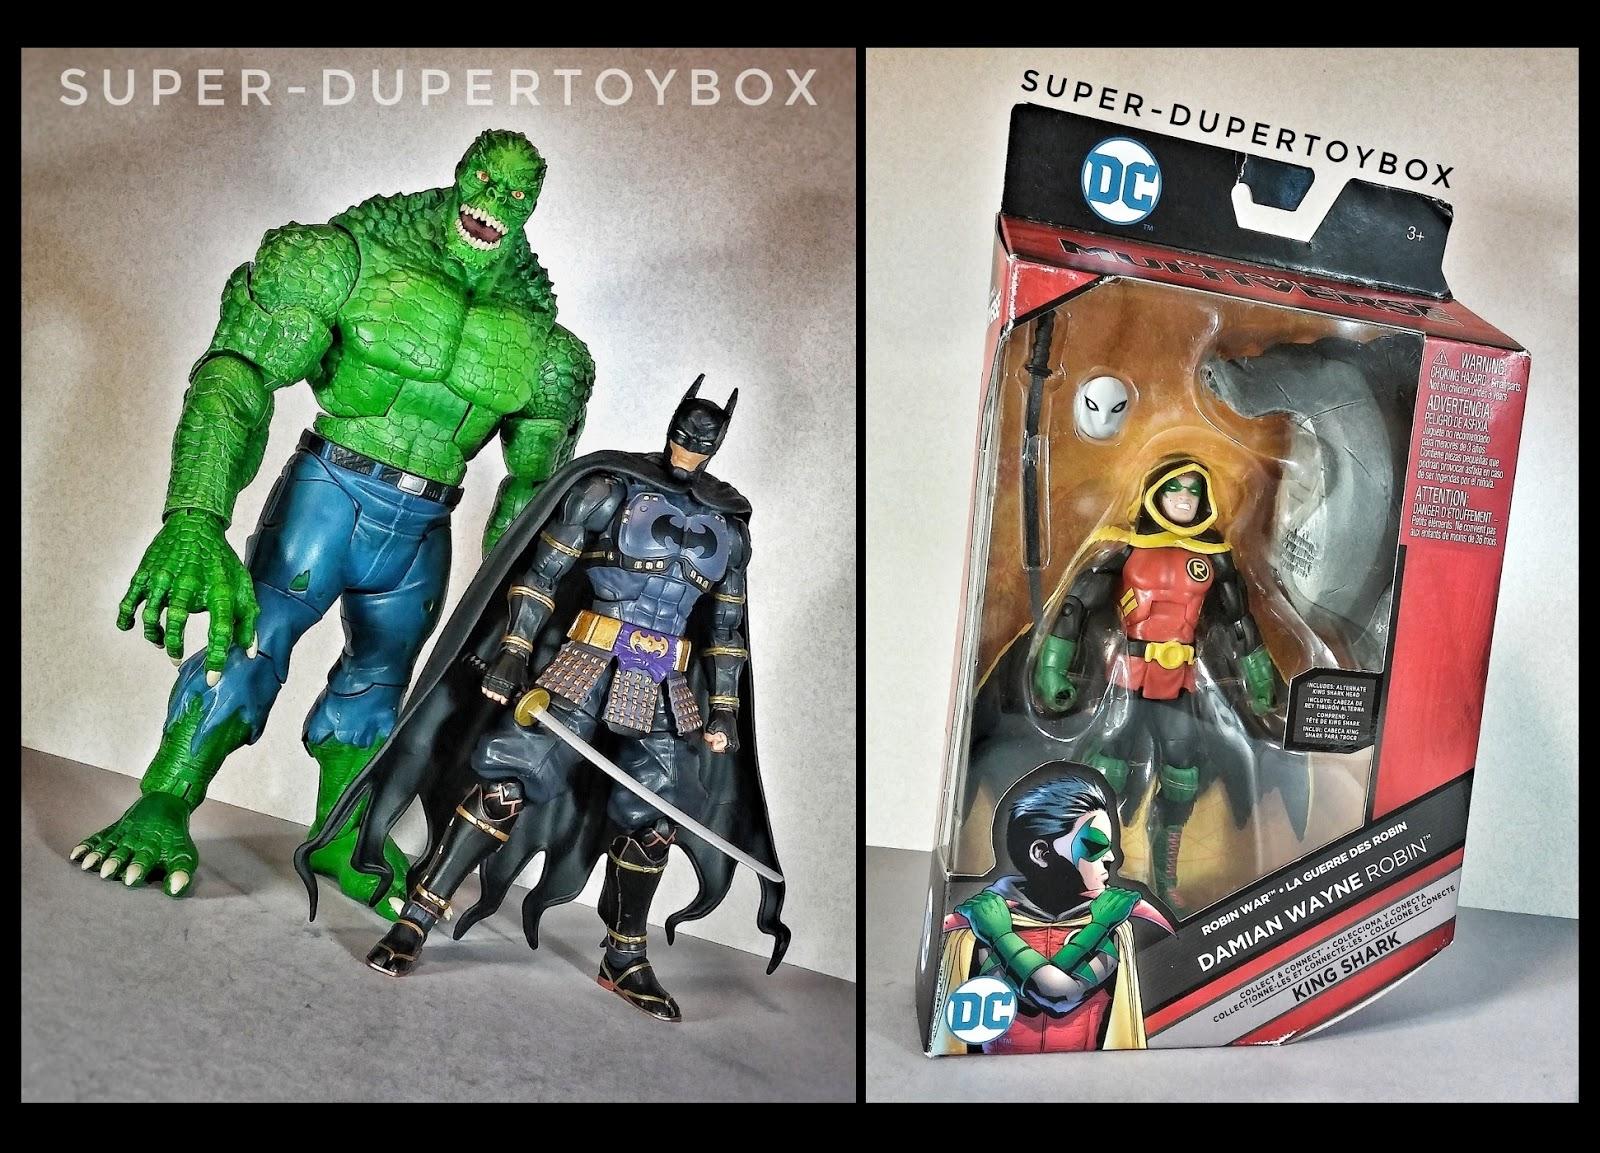 Super Dupertoybox Dc Multiverse Croc Batman Ninja Damian Wayne Robin